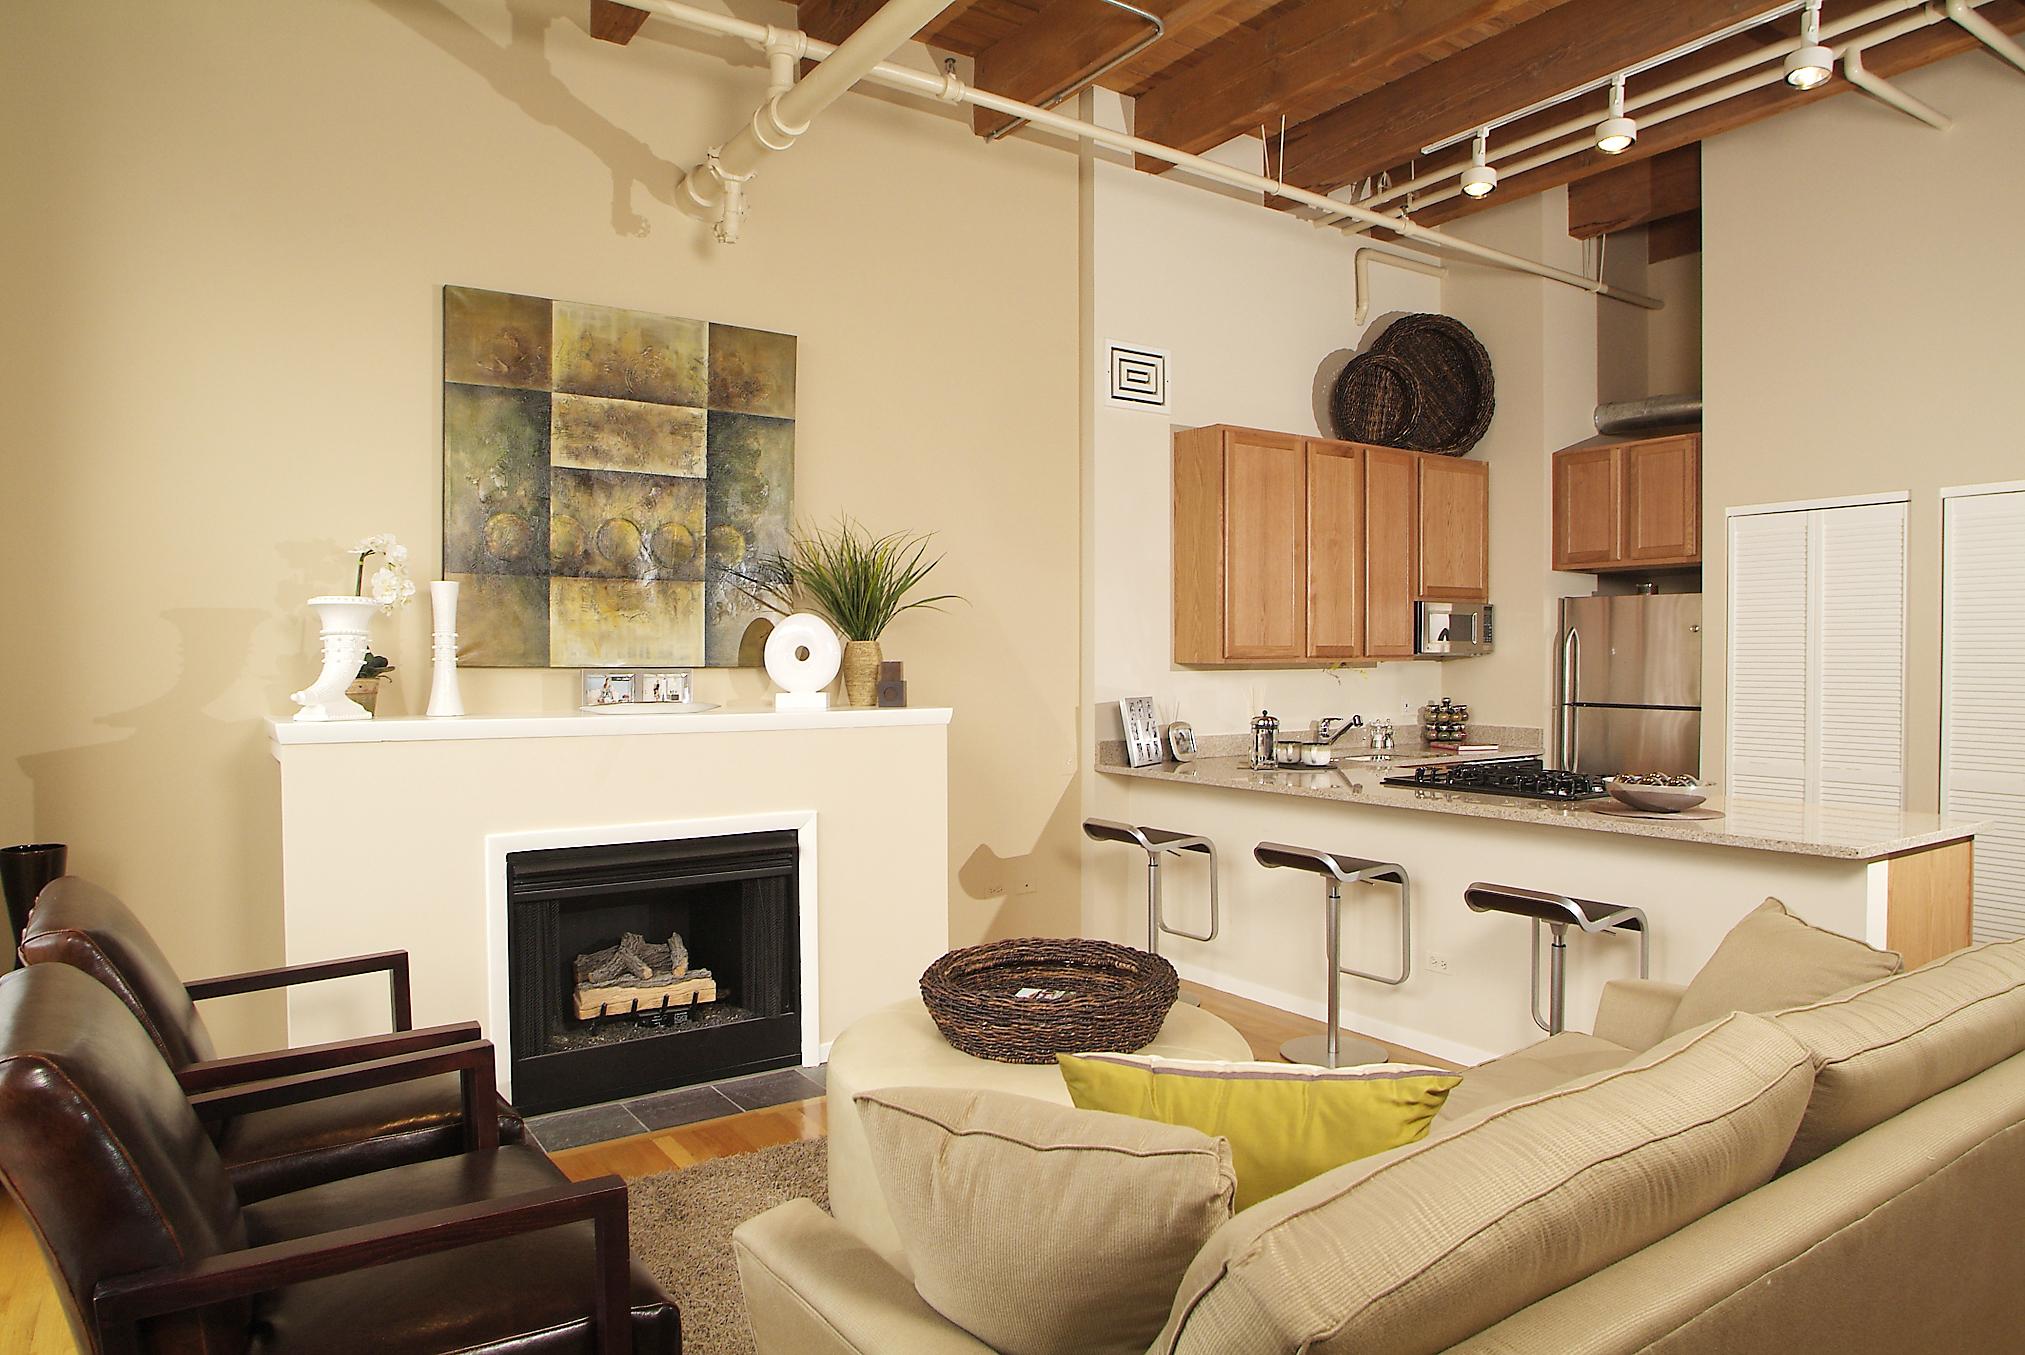 Prairie District Lofts